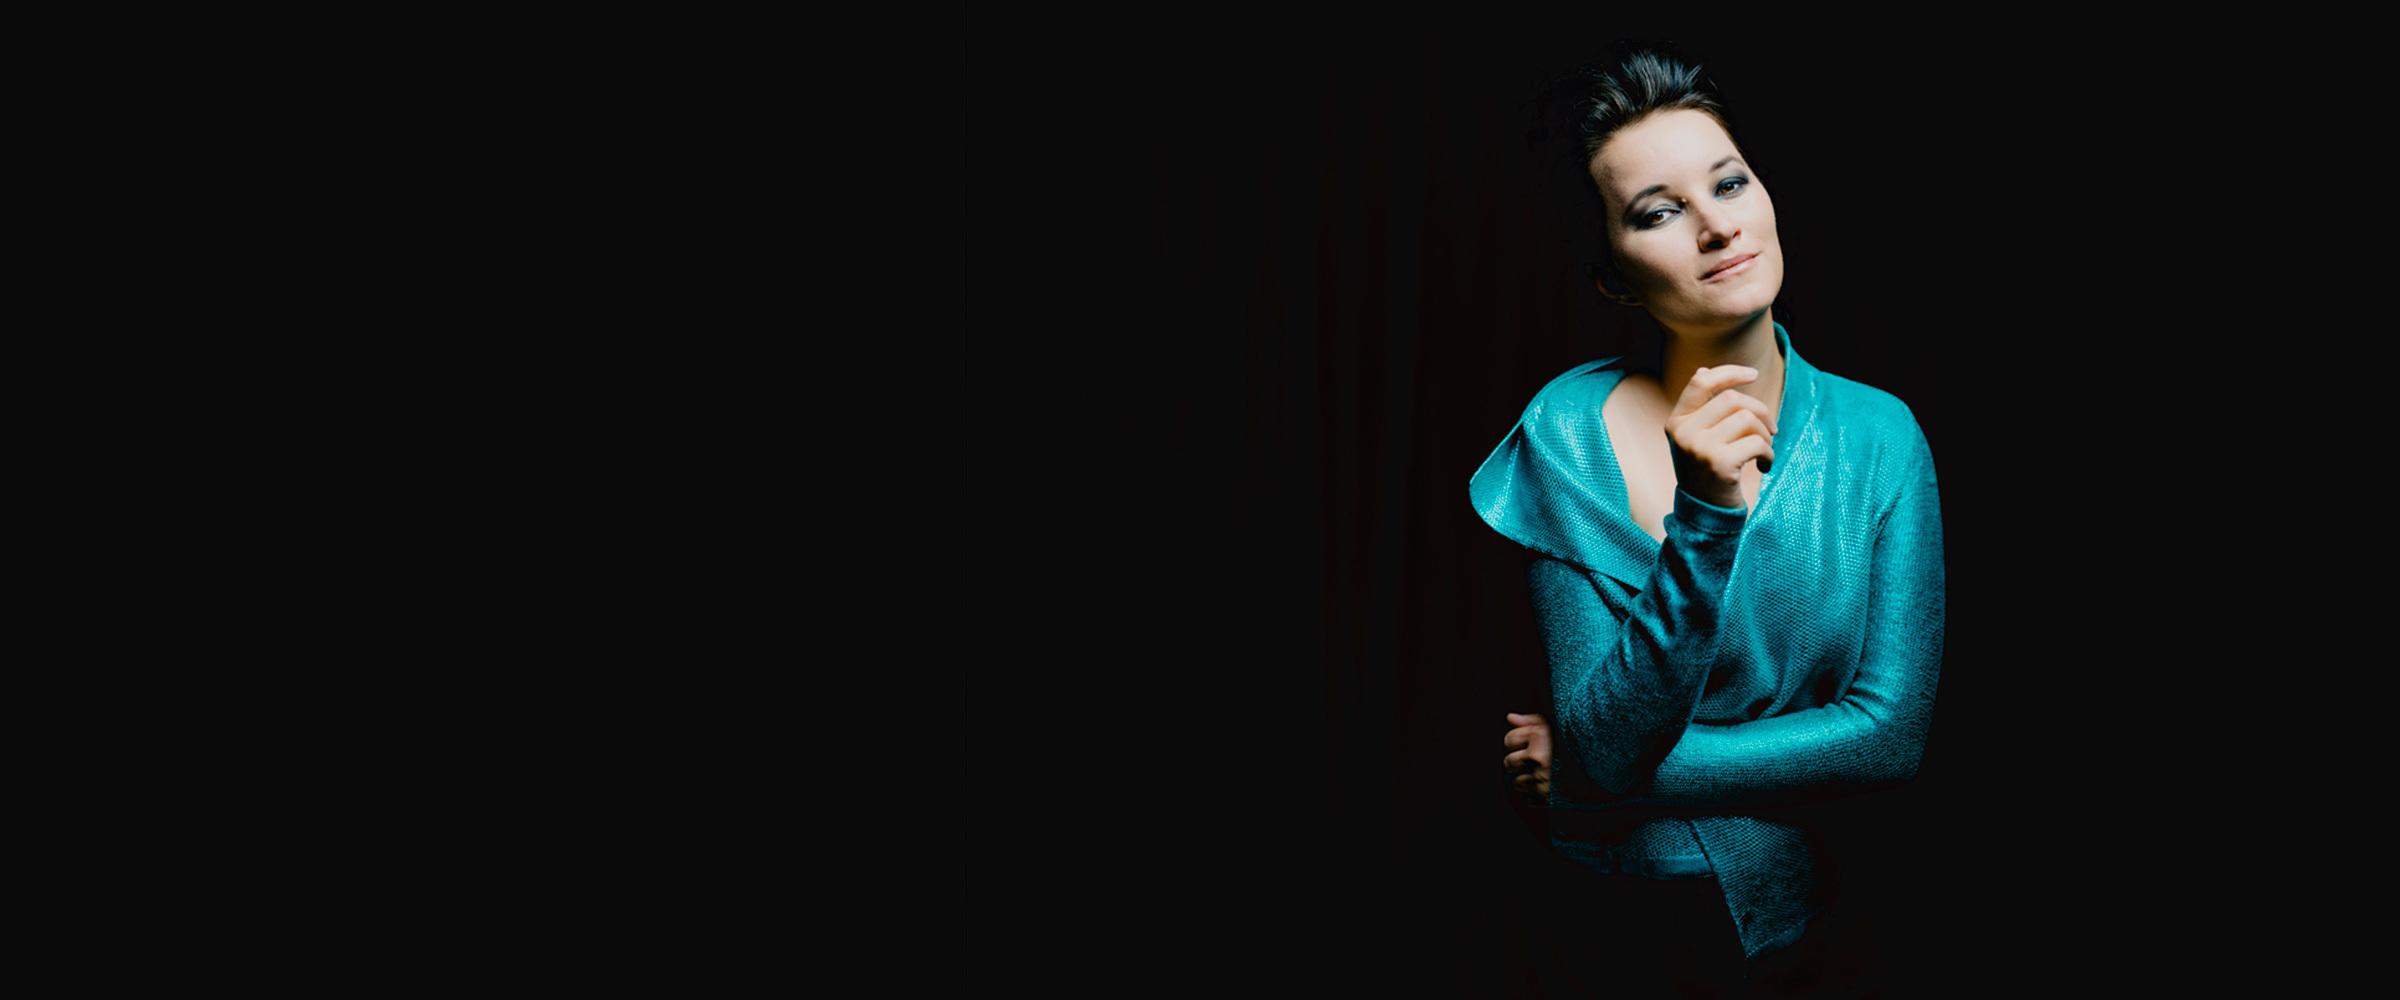 Anna Prohaska Idomeneo News Startseite